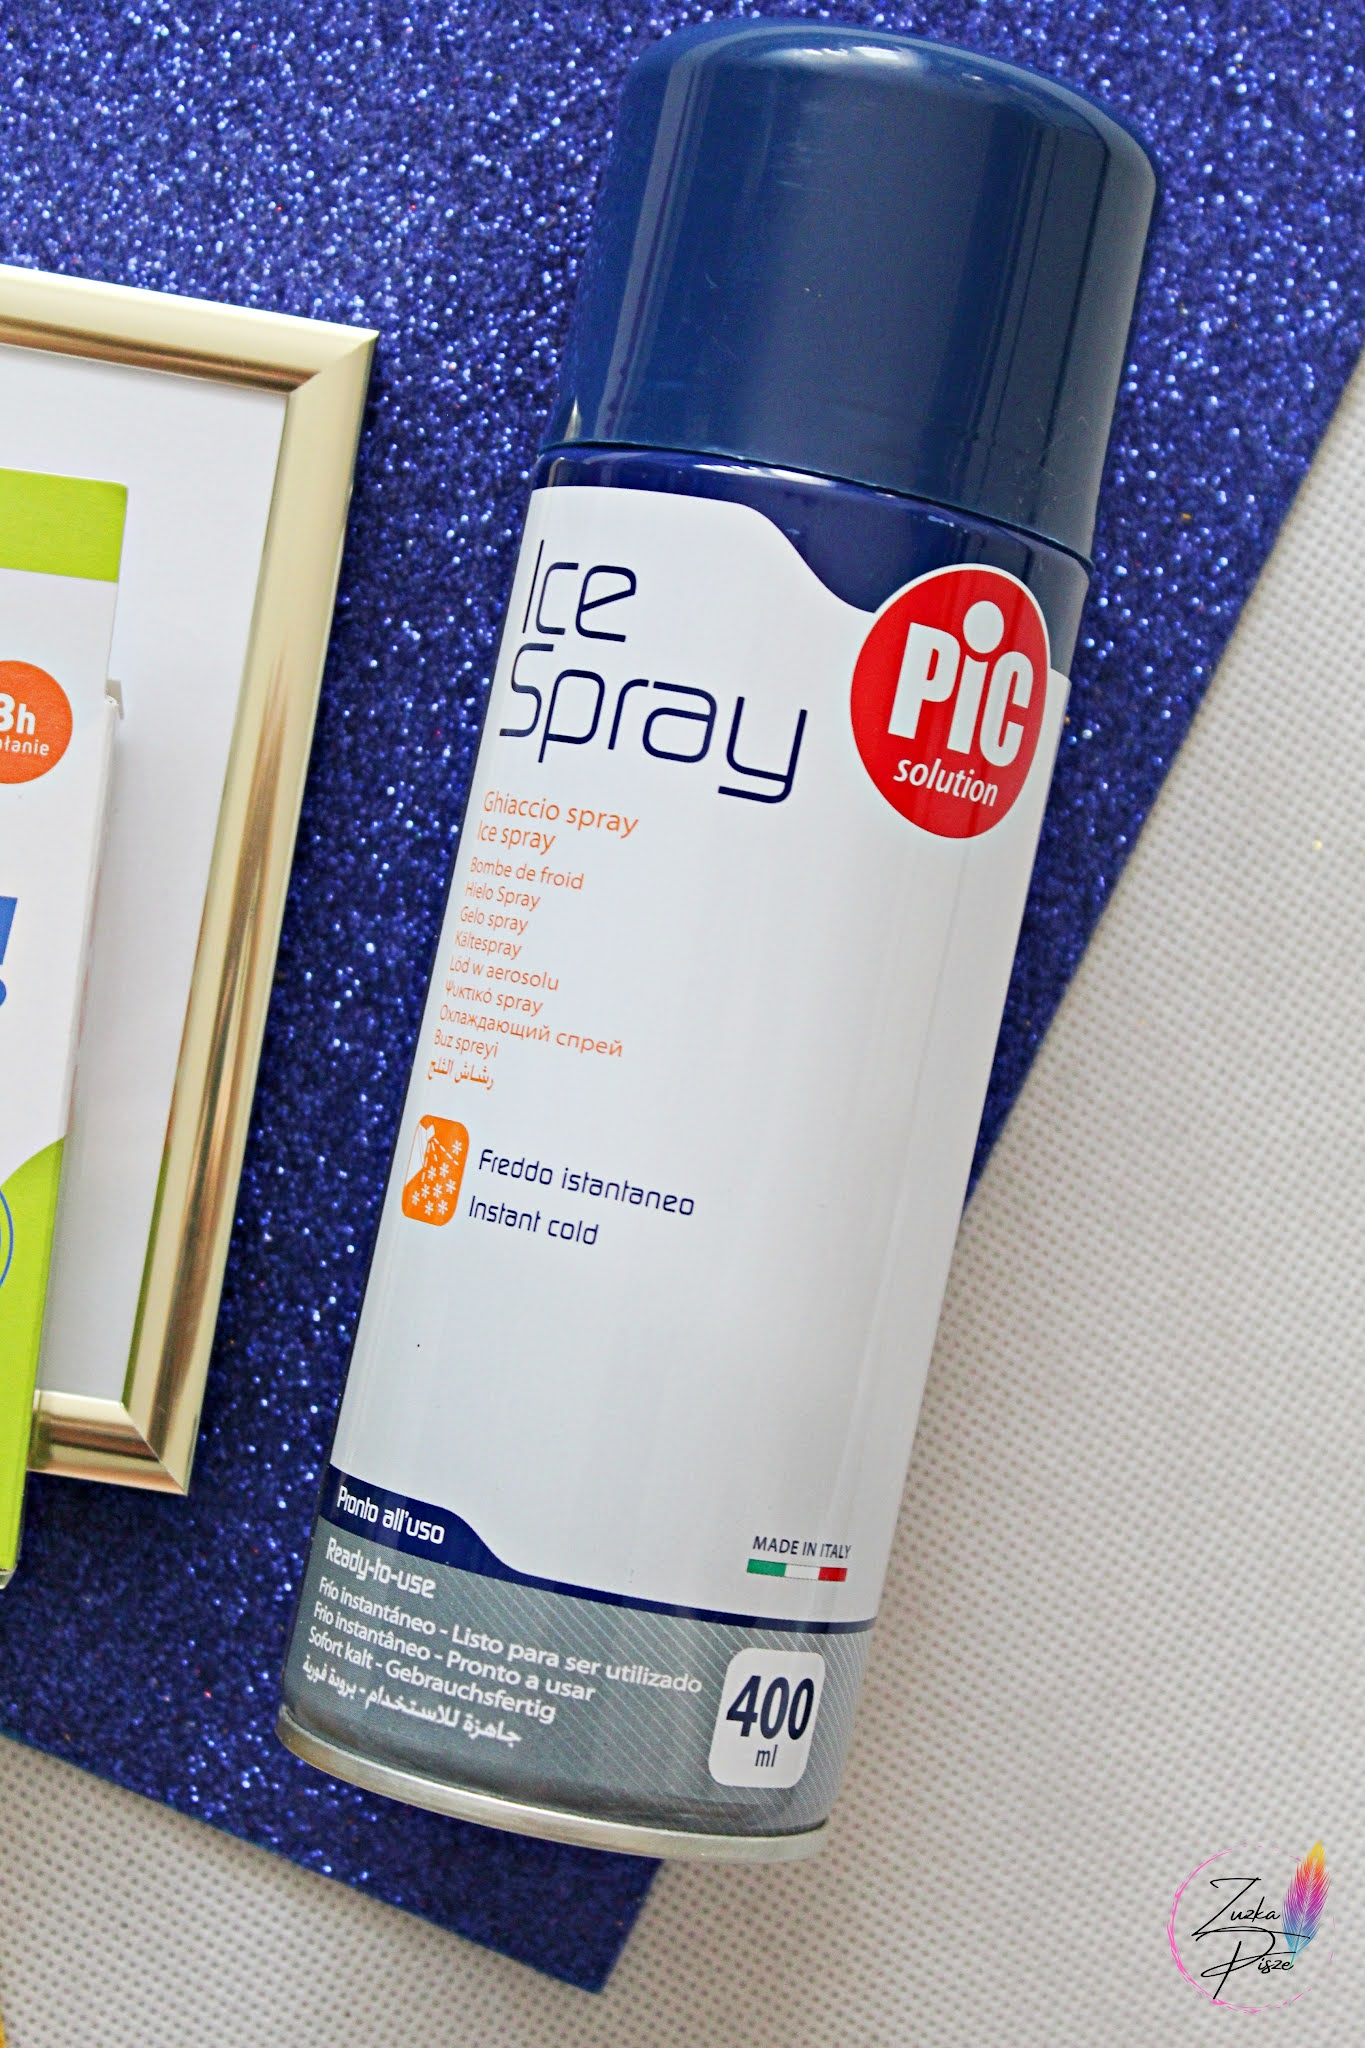 PIC Solution - Ice Spray